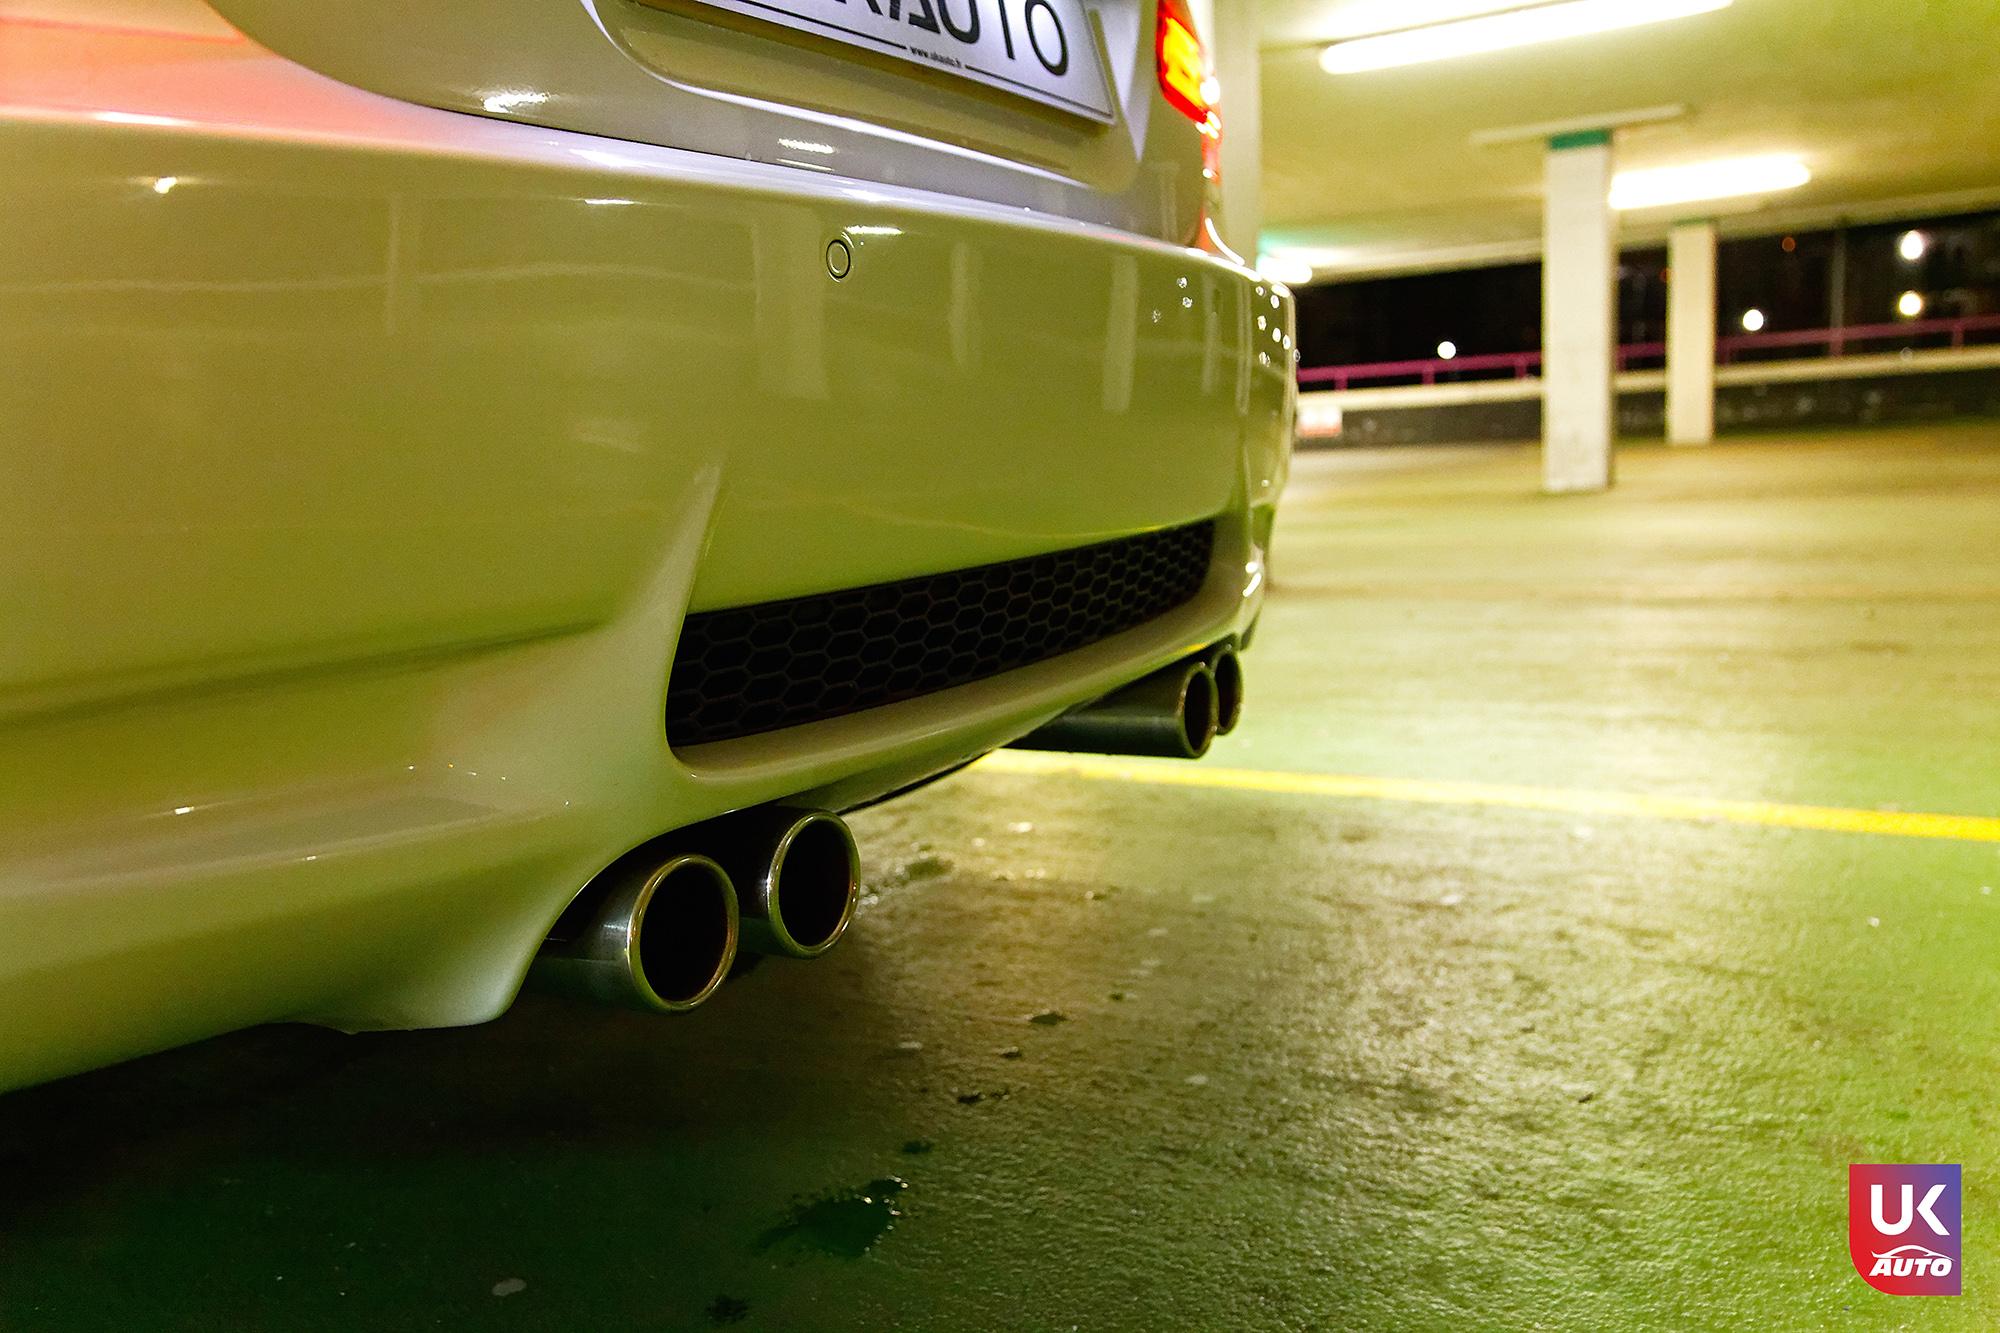 BMW m3 E92 import auto mandataire angleterre uk londres bmw leboncoin achat angleterre bmw voiture anglaise auto rhd e92 uk auto9 - Felecitation a Clement pour cette BMW M3 E92 COUPE RHD PACK CARBON BMW ANGLETERRE VOITURE UK